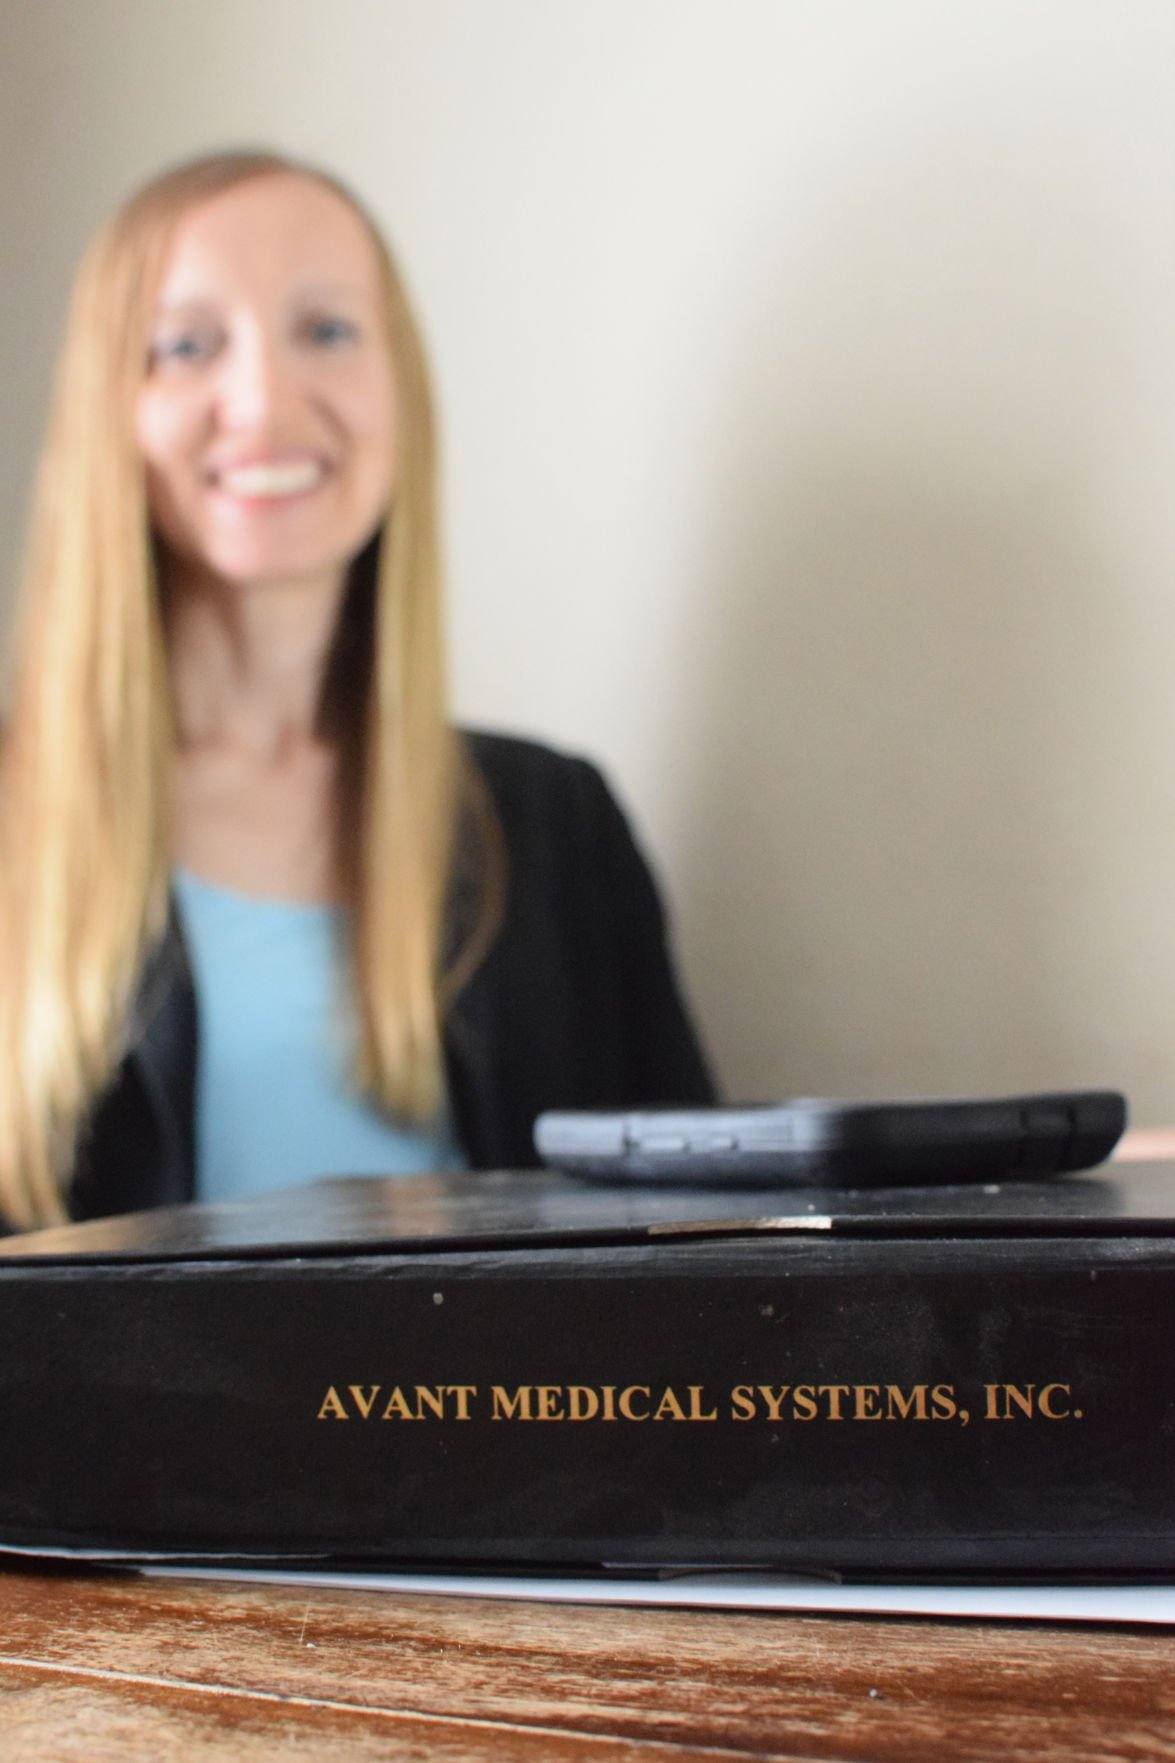 Avant Medical System